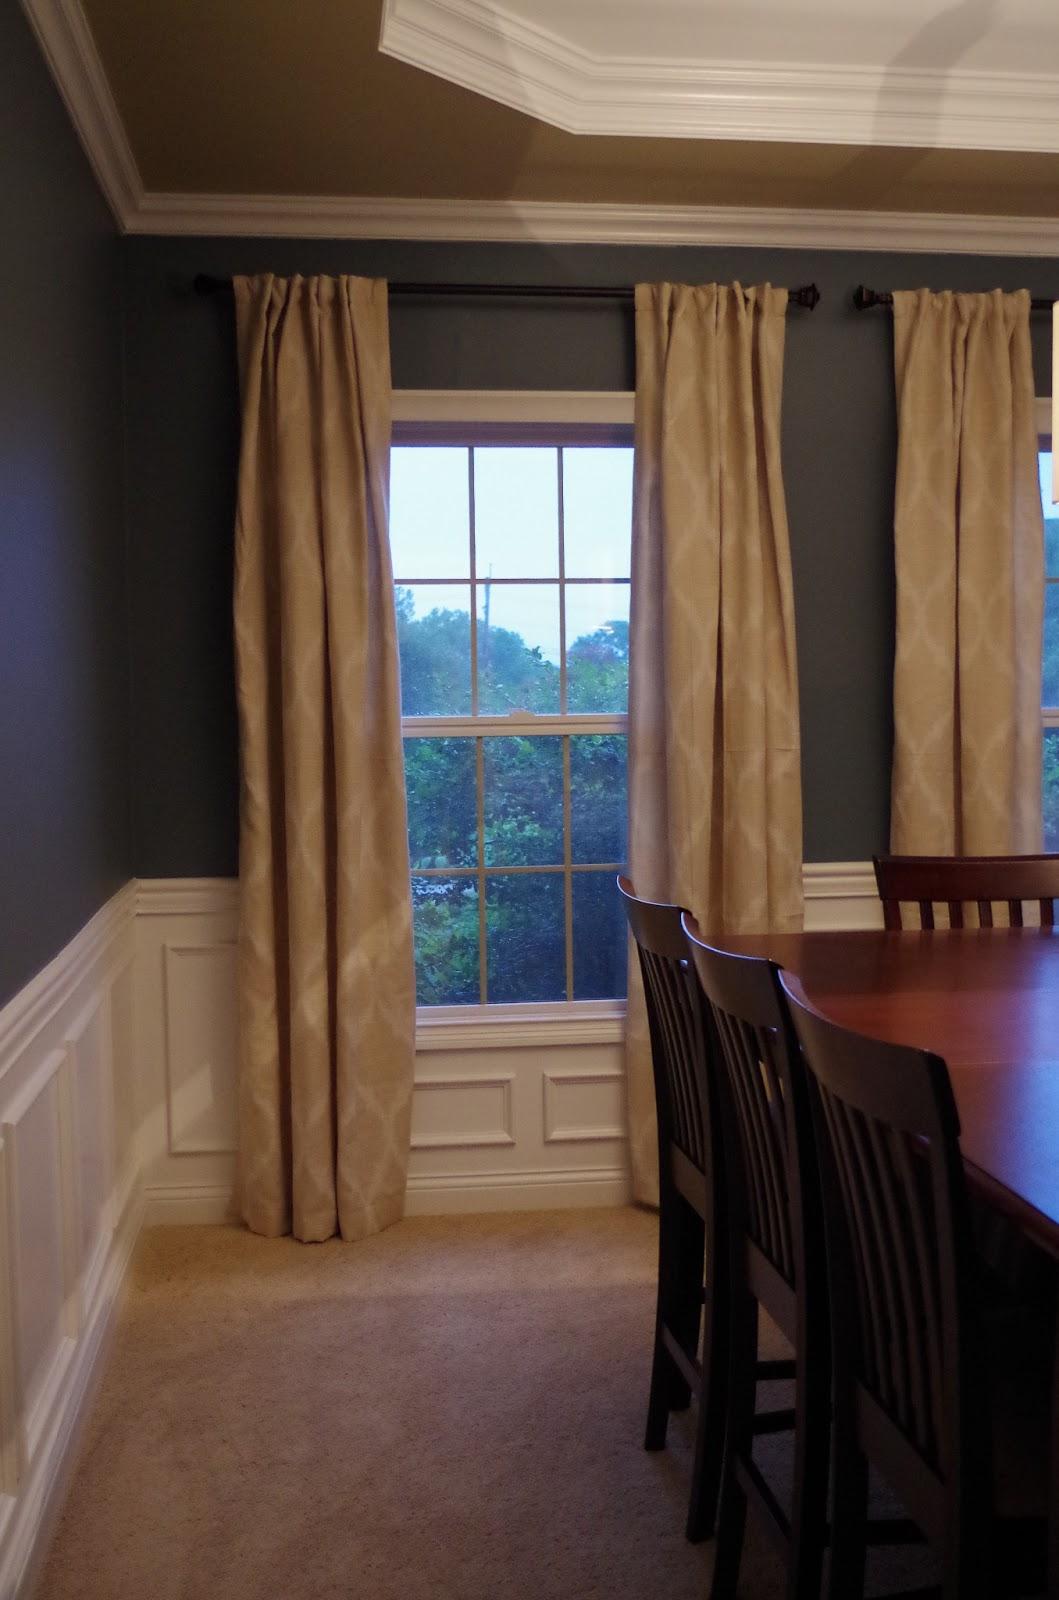 9 Foot Ceiling Curtains Hbm Blog